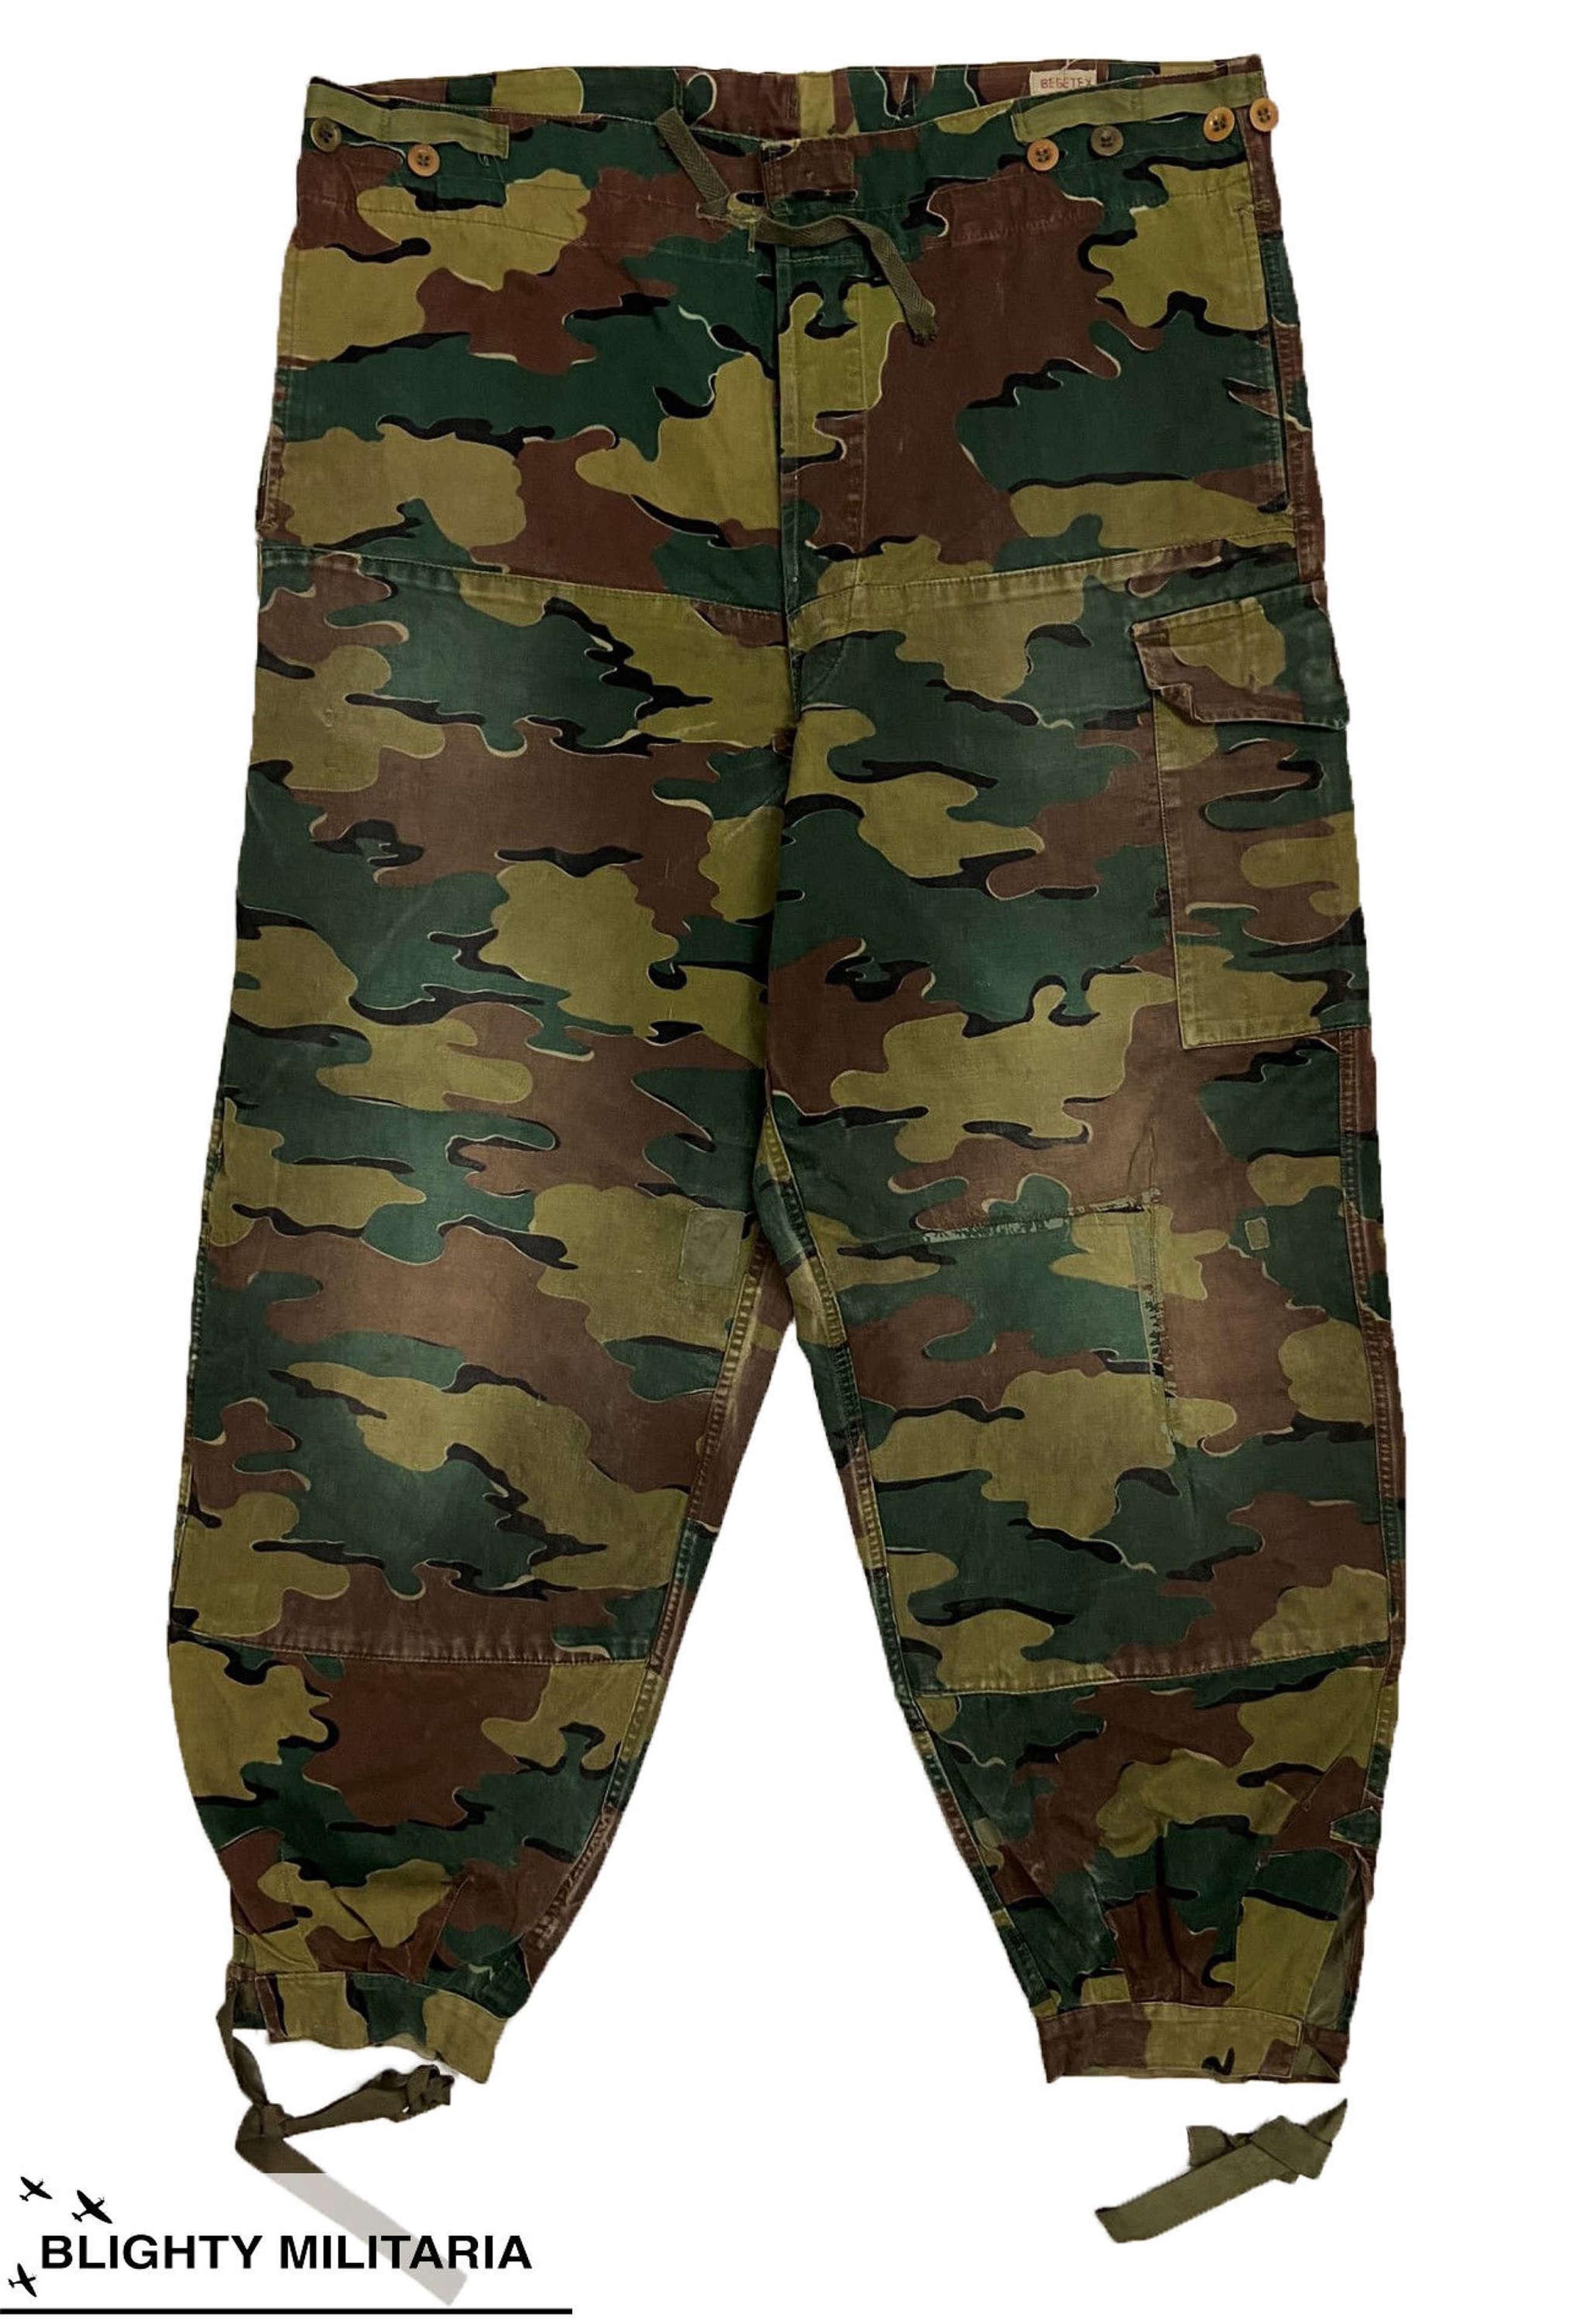 Original 1958 Dated Belgium M/56 Jigsaw Pattern Camouflage Trousers